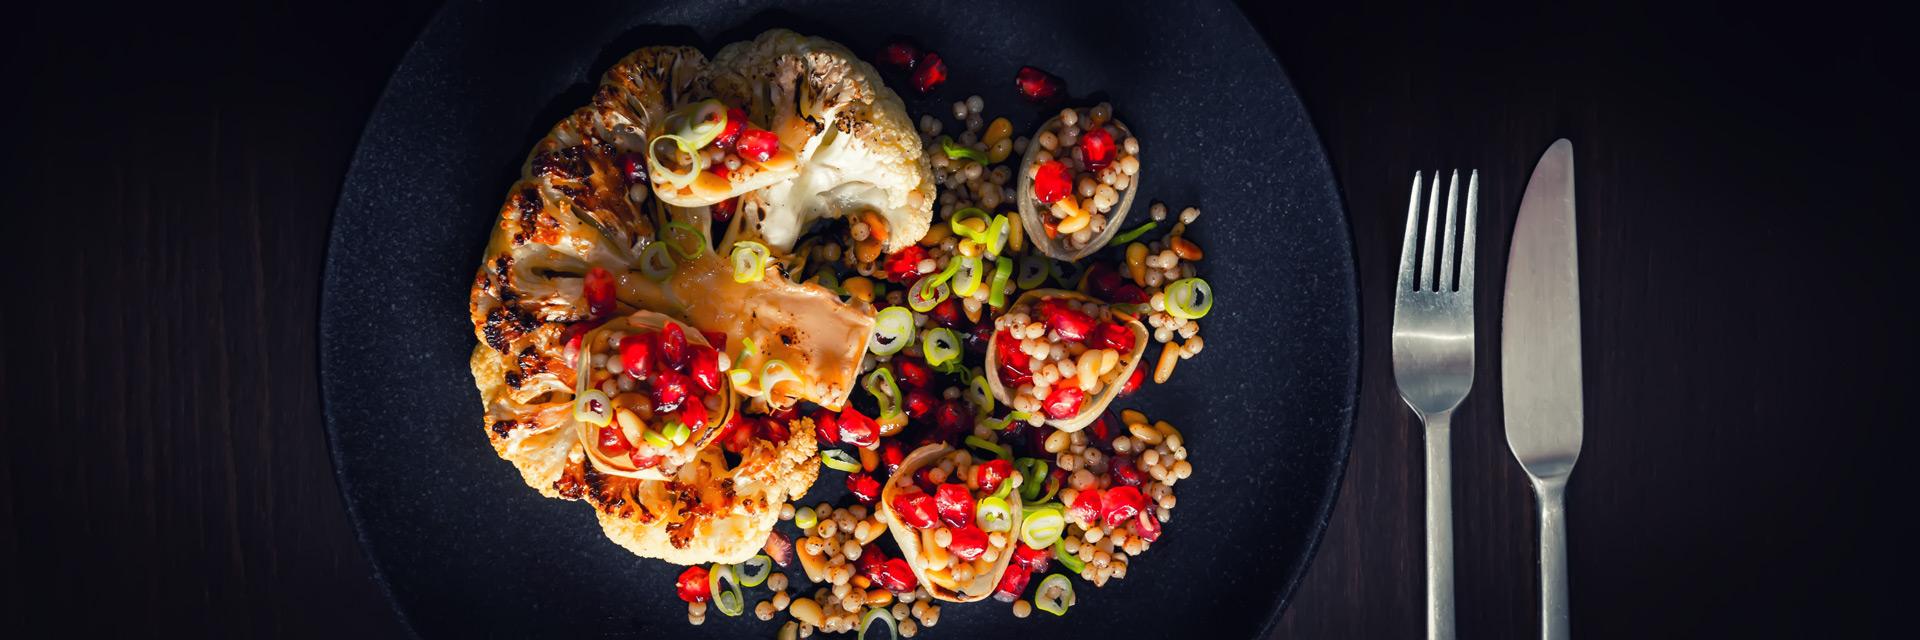 Persian Roasted Cauliflower Steak